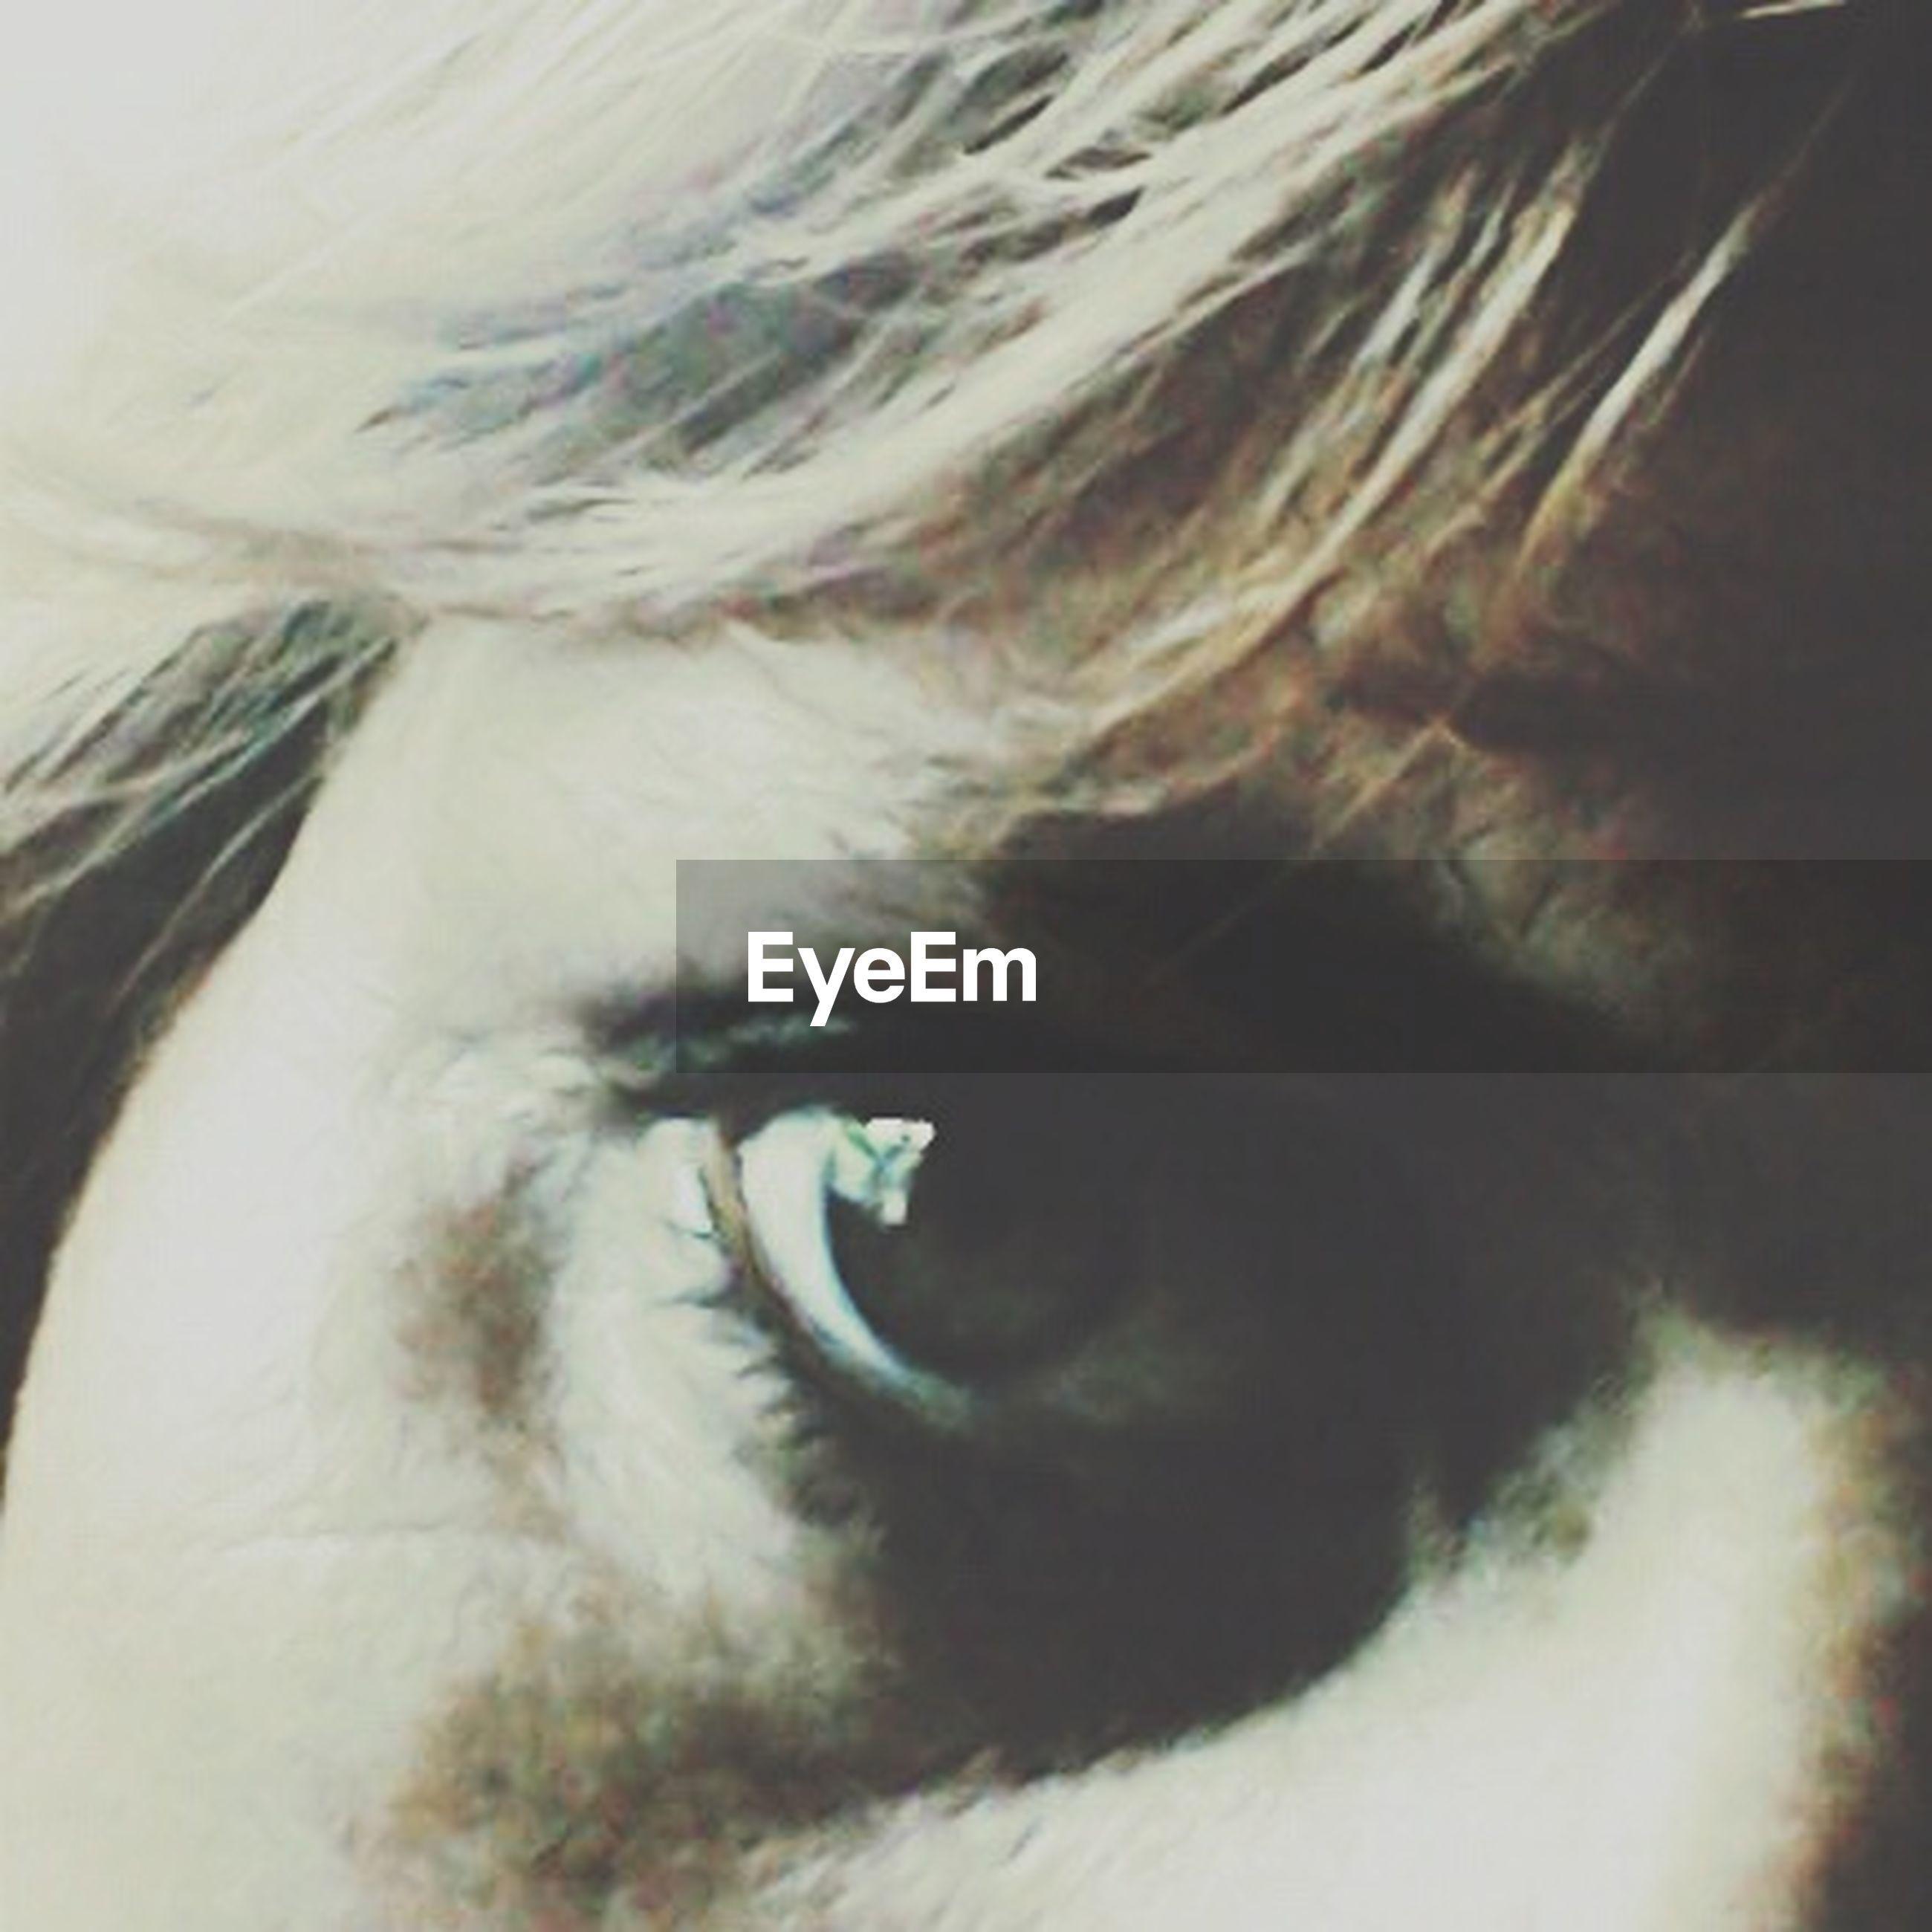 indoors, close-up, human eye, looking at camera, portrait, part of, pets, domestic animals, eyelash, one animal, eyesight, animal body part, animal head, headshot, staring, sensory perception, animal eye